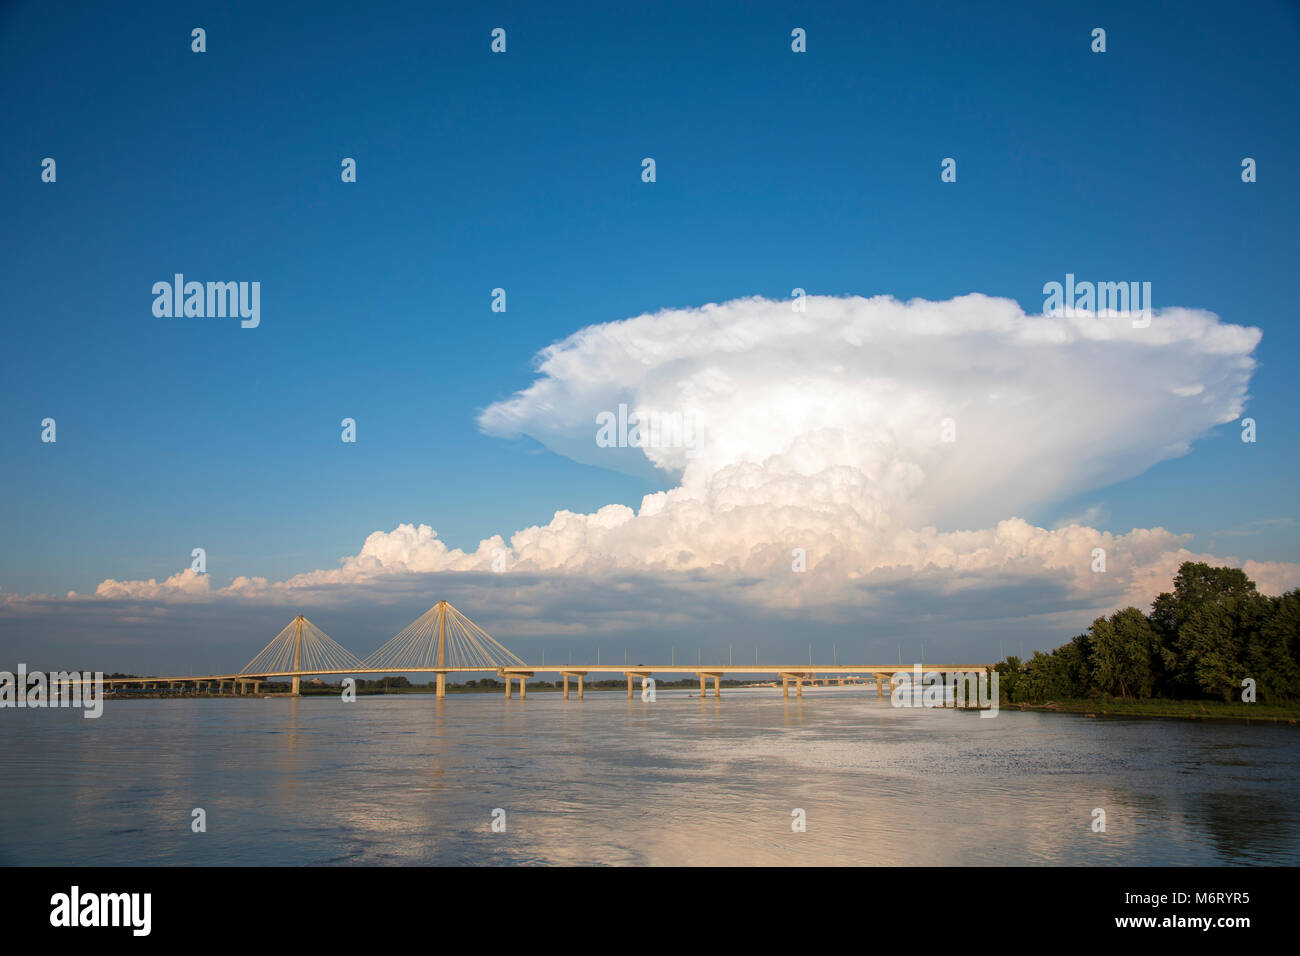 63895-15310 Clark Bridge over Mississippi River and thunderstorm (Cumulonimbus Cloud) Alton, IL - Stock Image